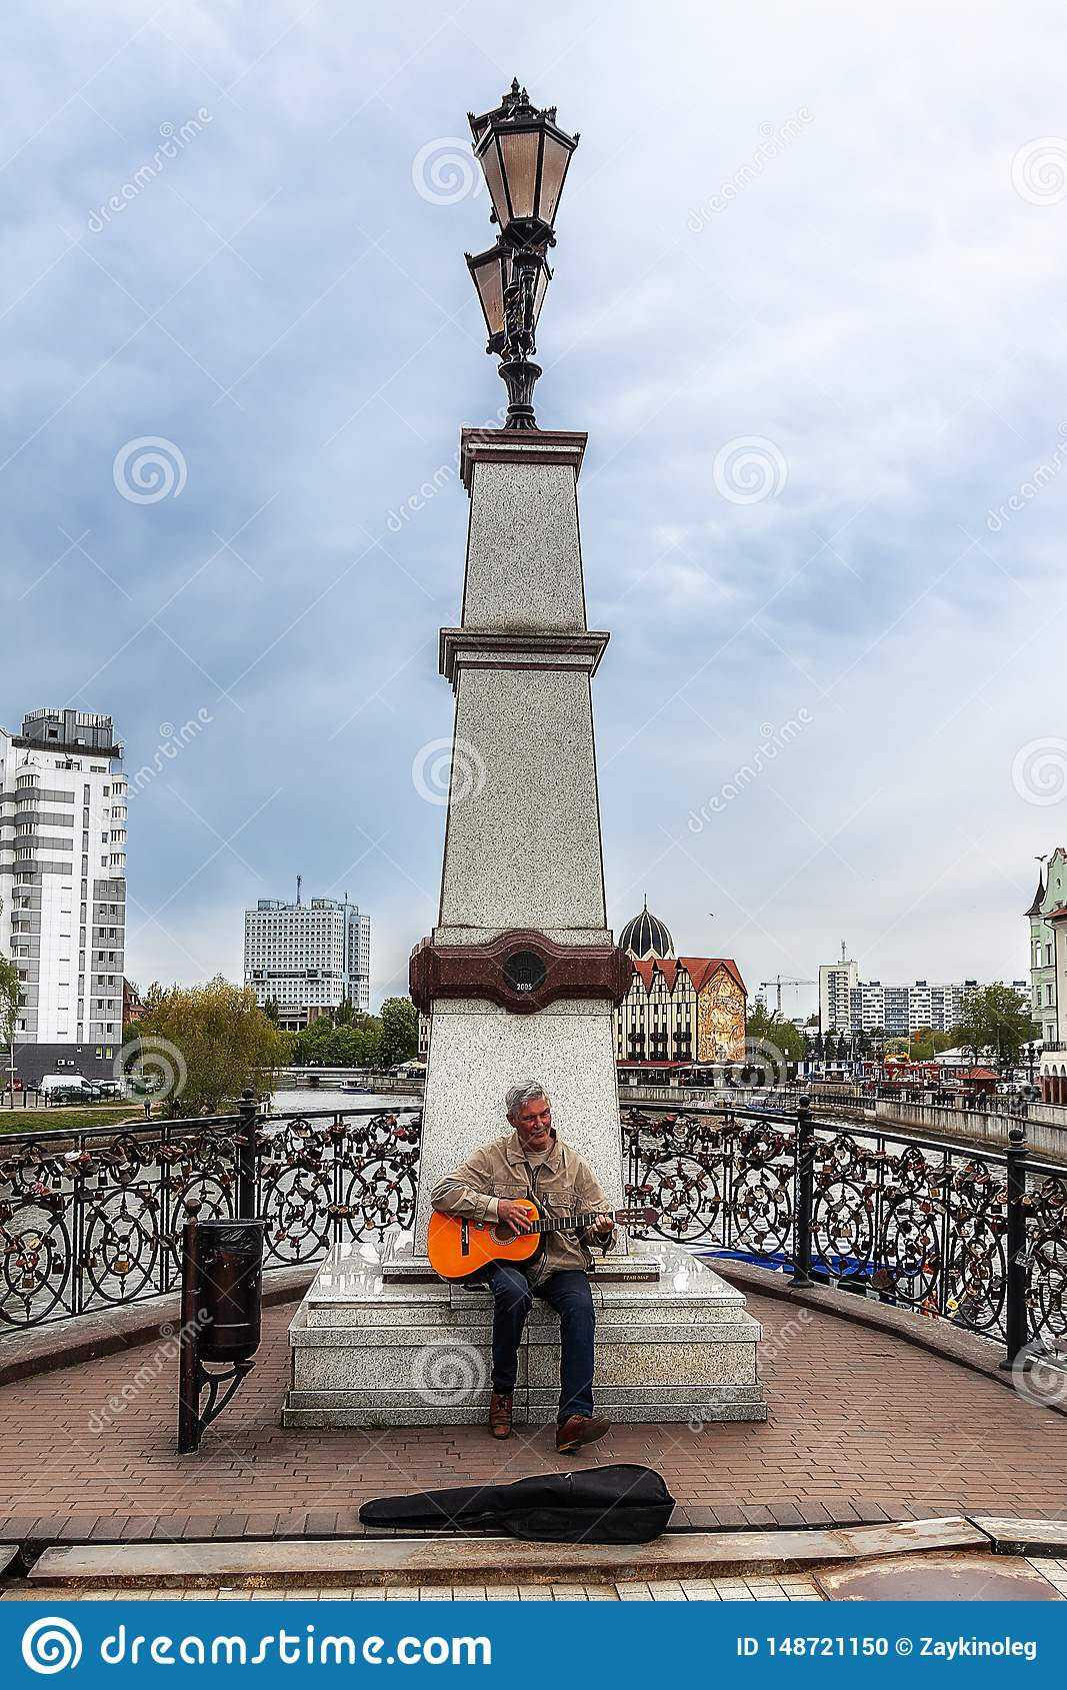 Kaliningrad Russia 05.01.2019 Street musician plays the guitar near the monument